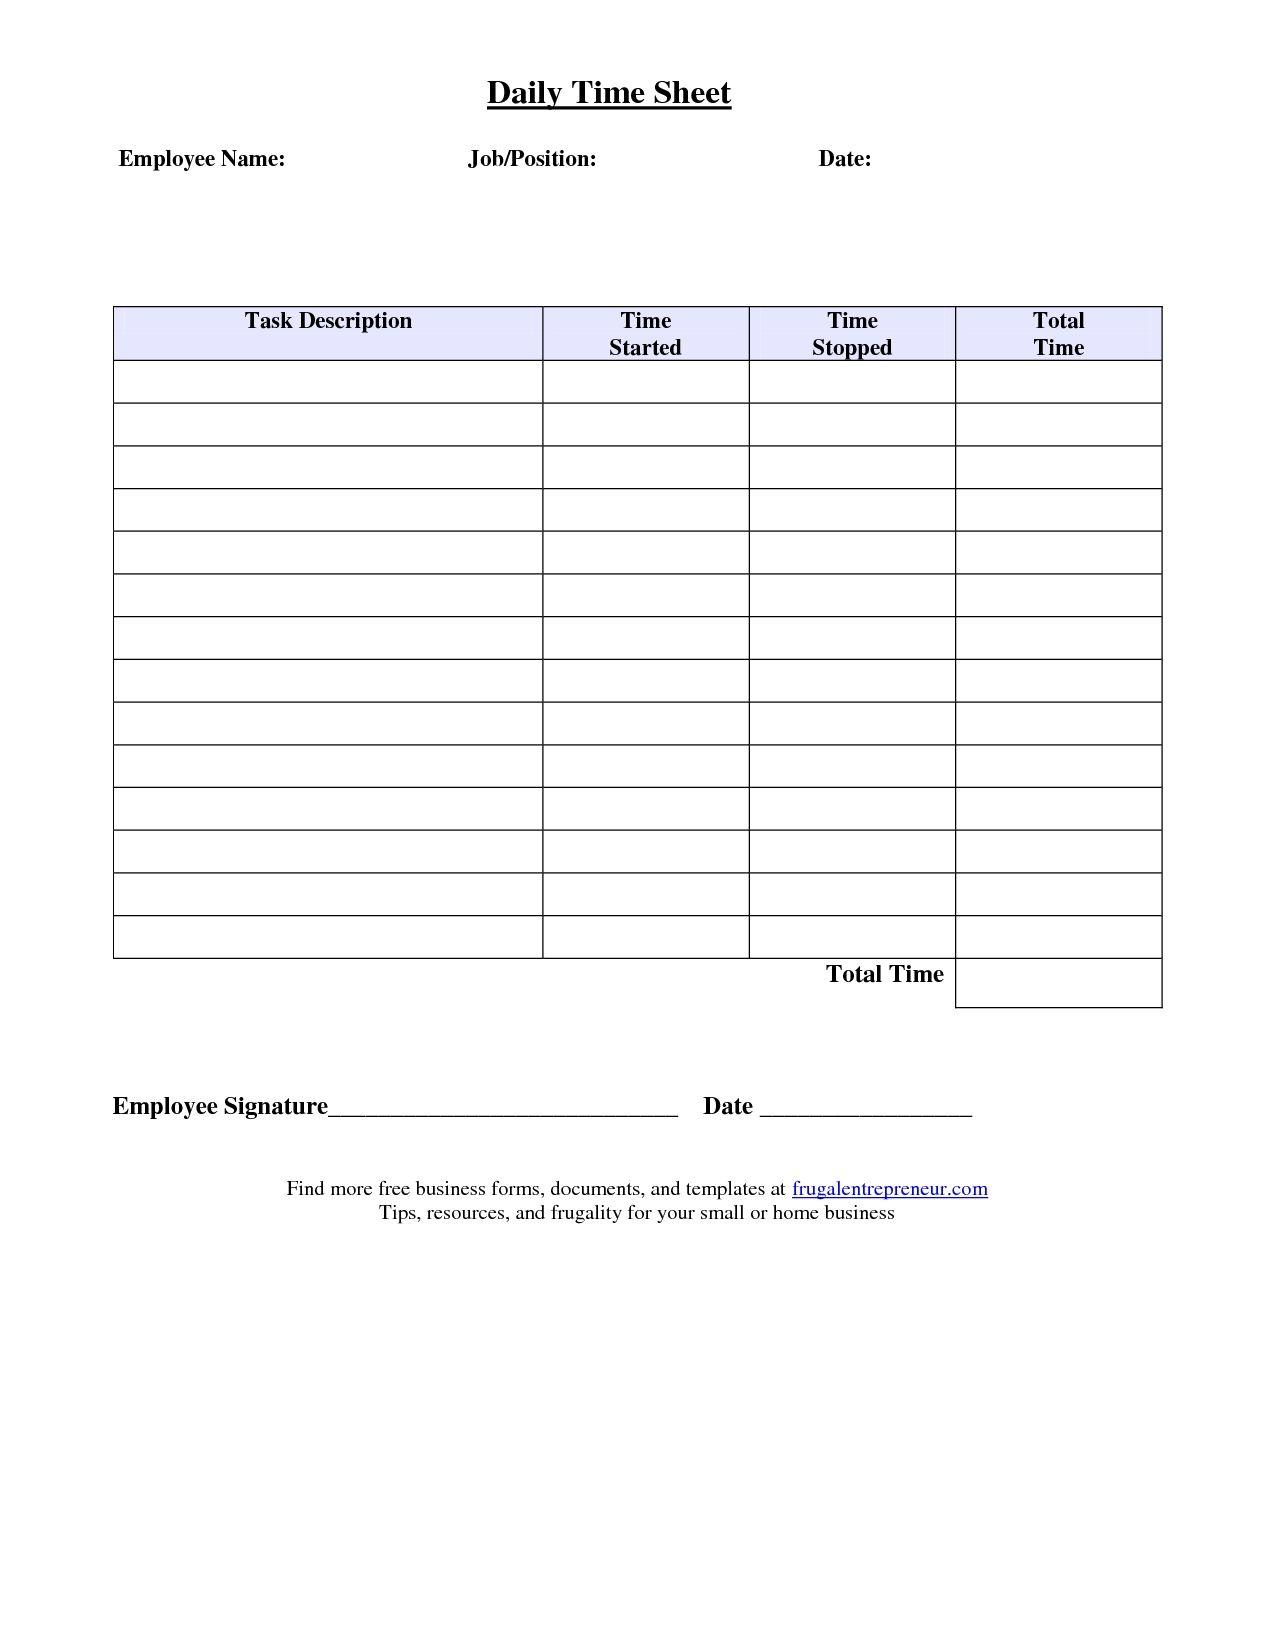 Job Sheet Format Excel Best Photos Of Job Time Sheet Template6 Timesheet Template Labels Printables Free Templates Templates